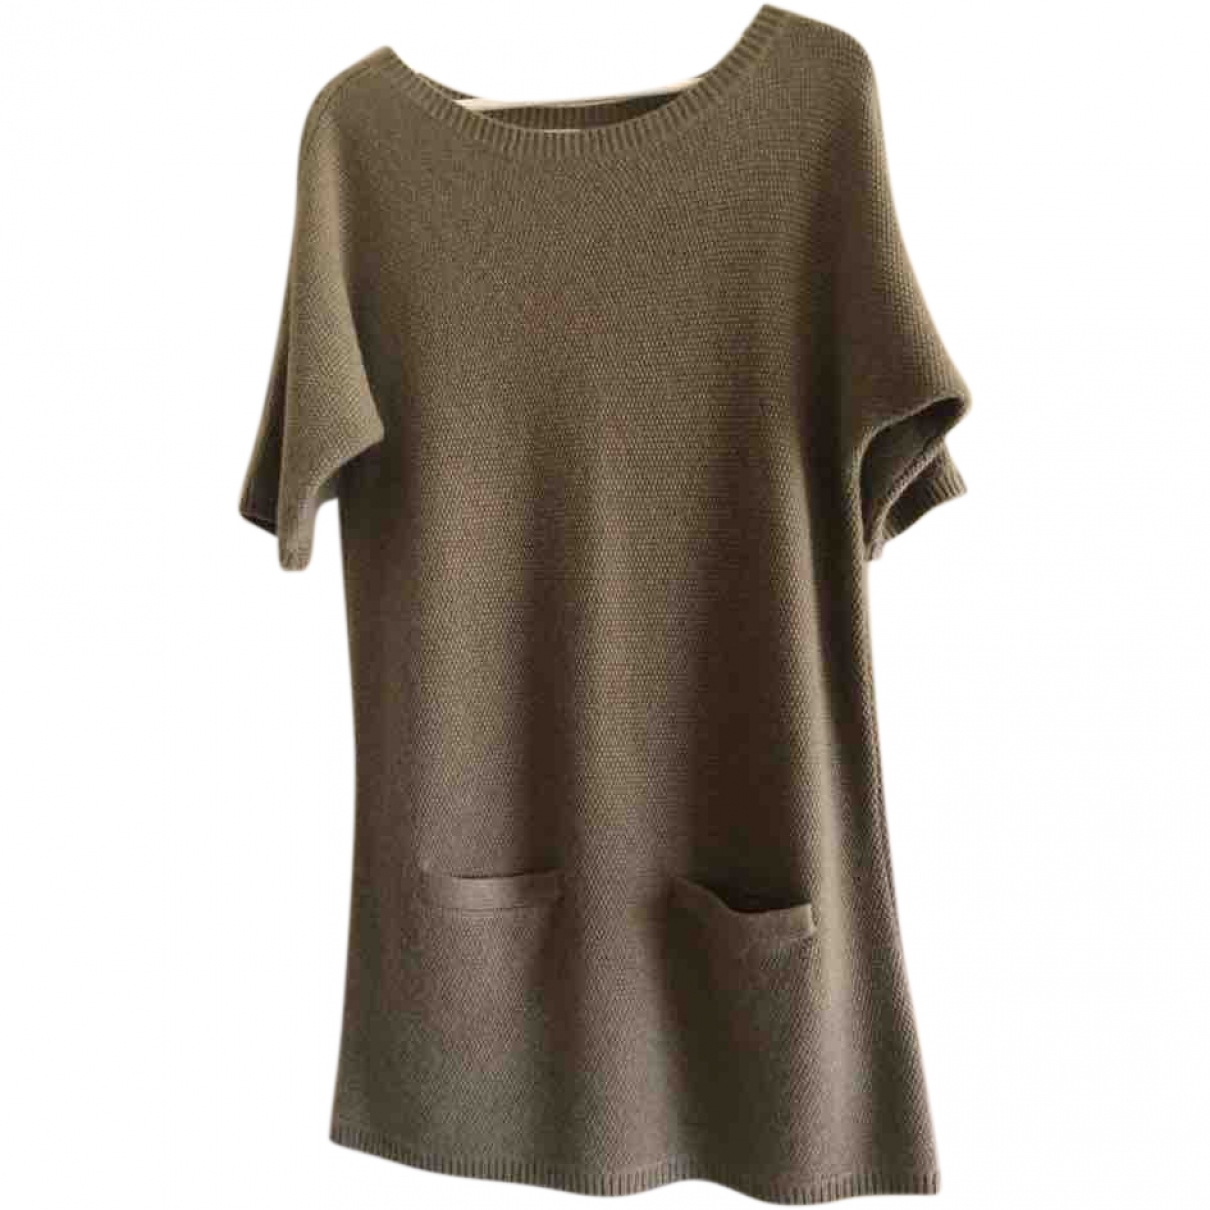 Chloé \N Khaki Wool dress for Women S